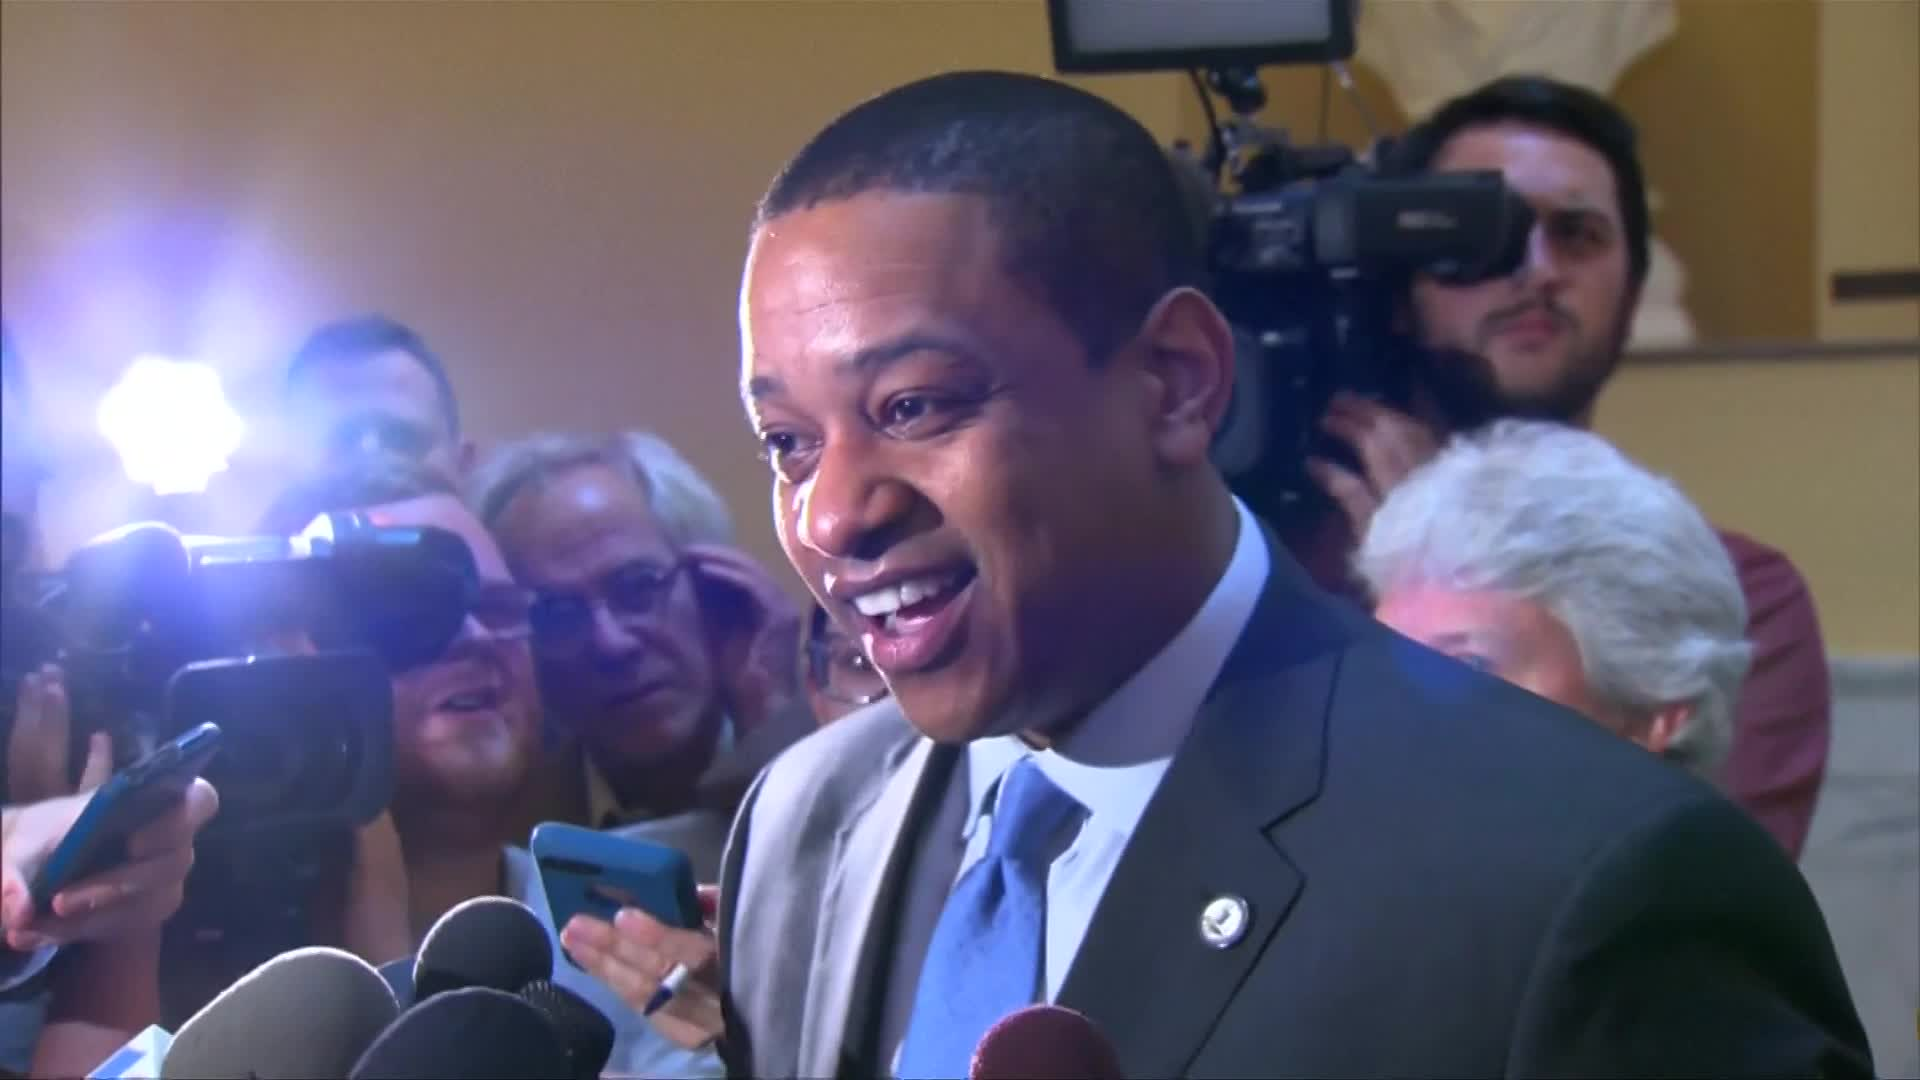 Virginia Lt. Gov. Justin Fairfax's Accuser Releases Statement On Sexual Assault Allegations